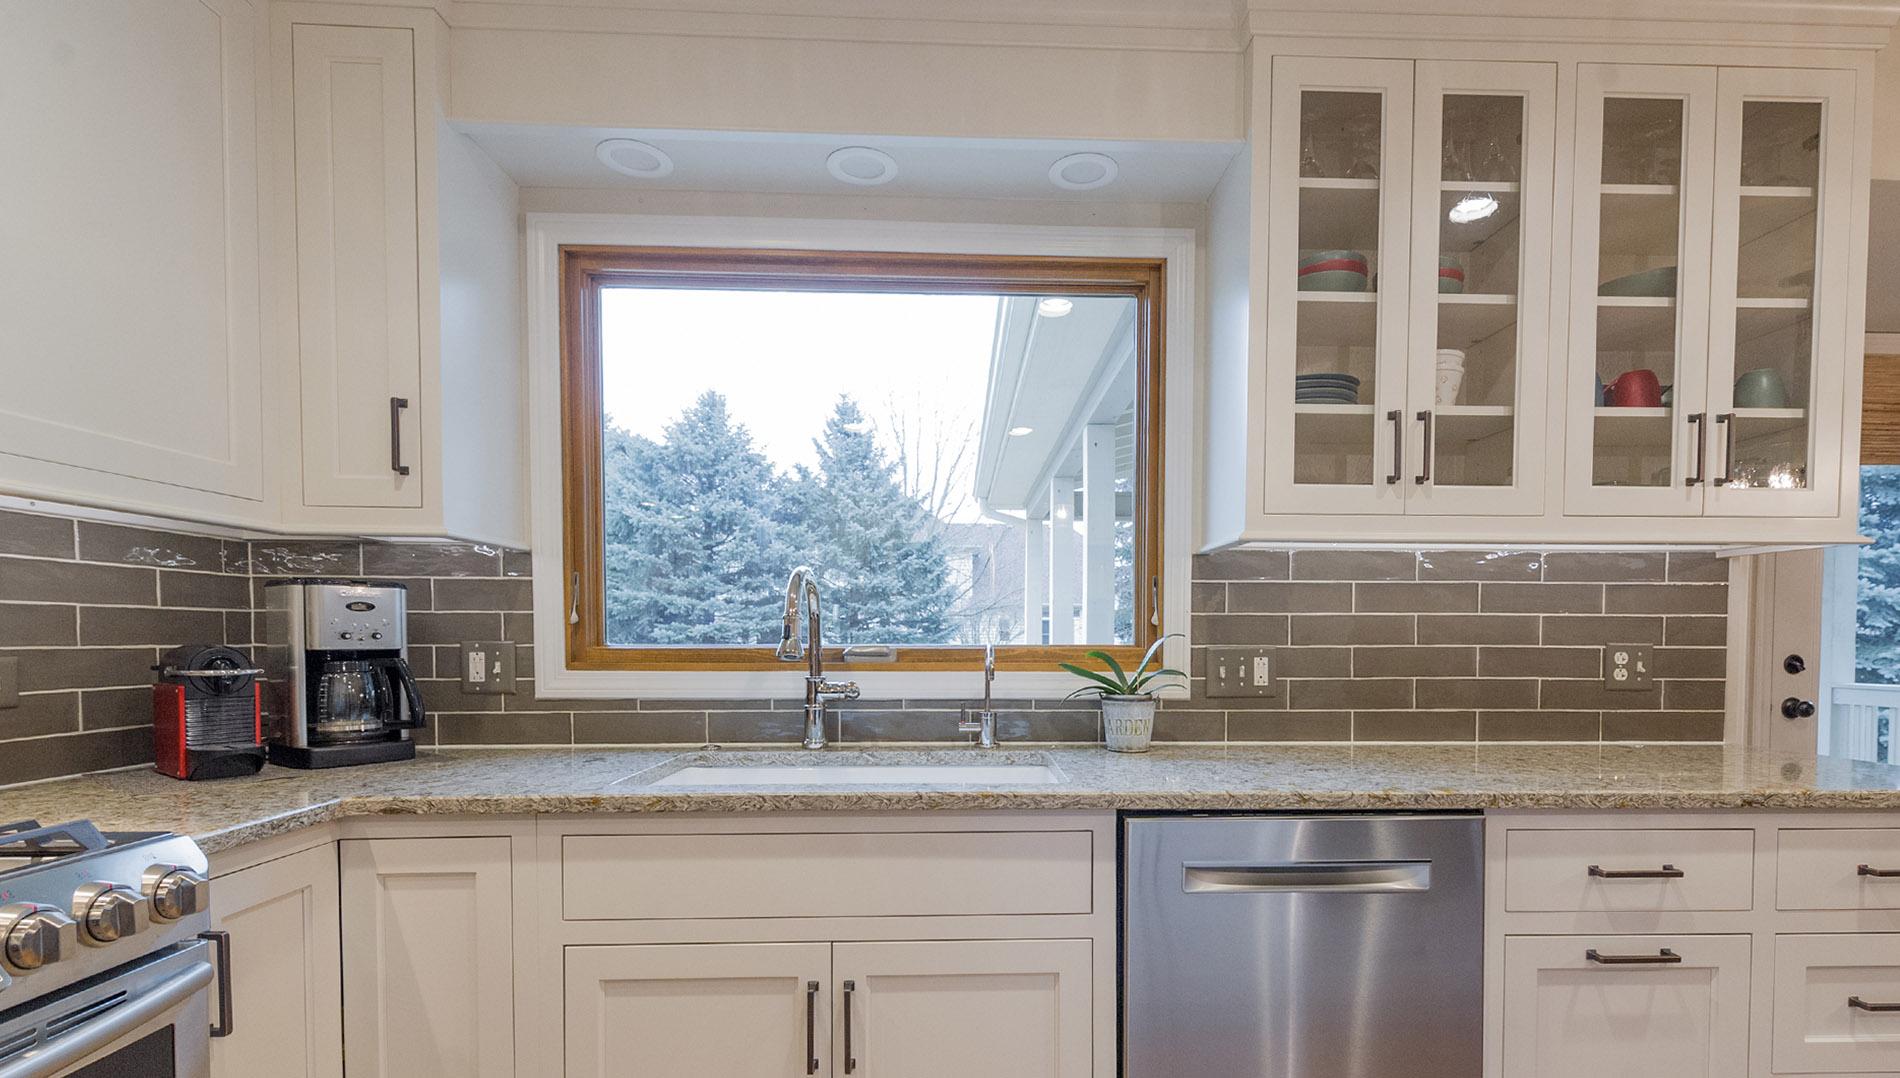 Carefree design in aurora s oakhurst Kitchen design and remodeling aurora